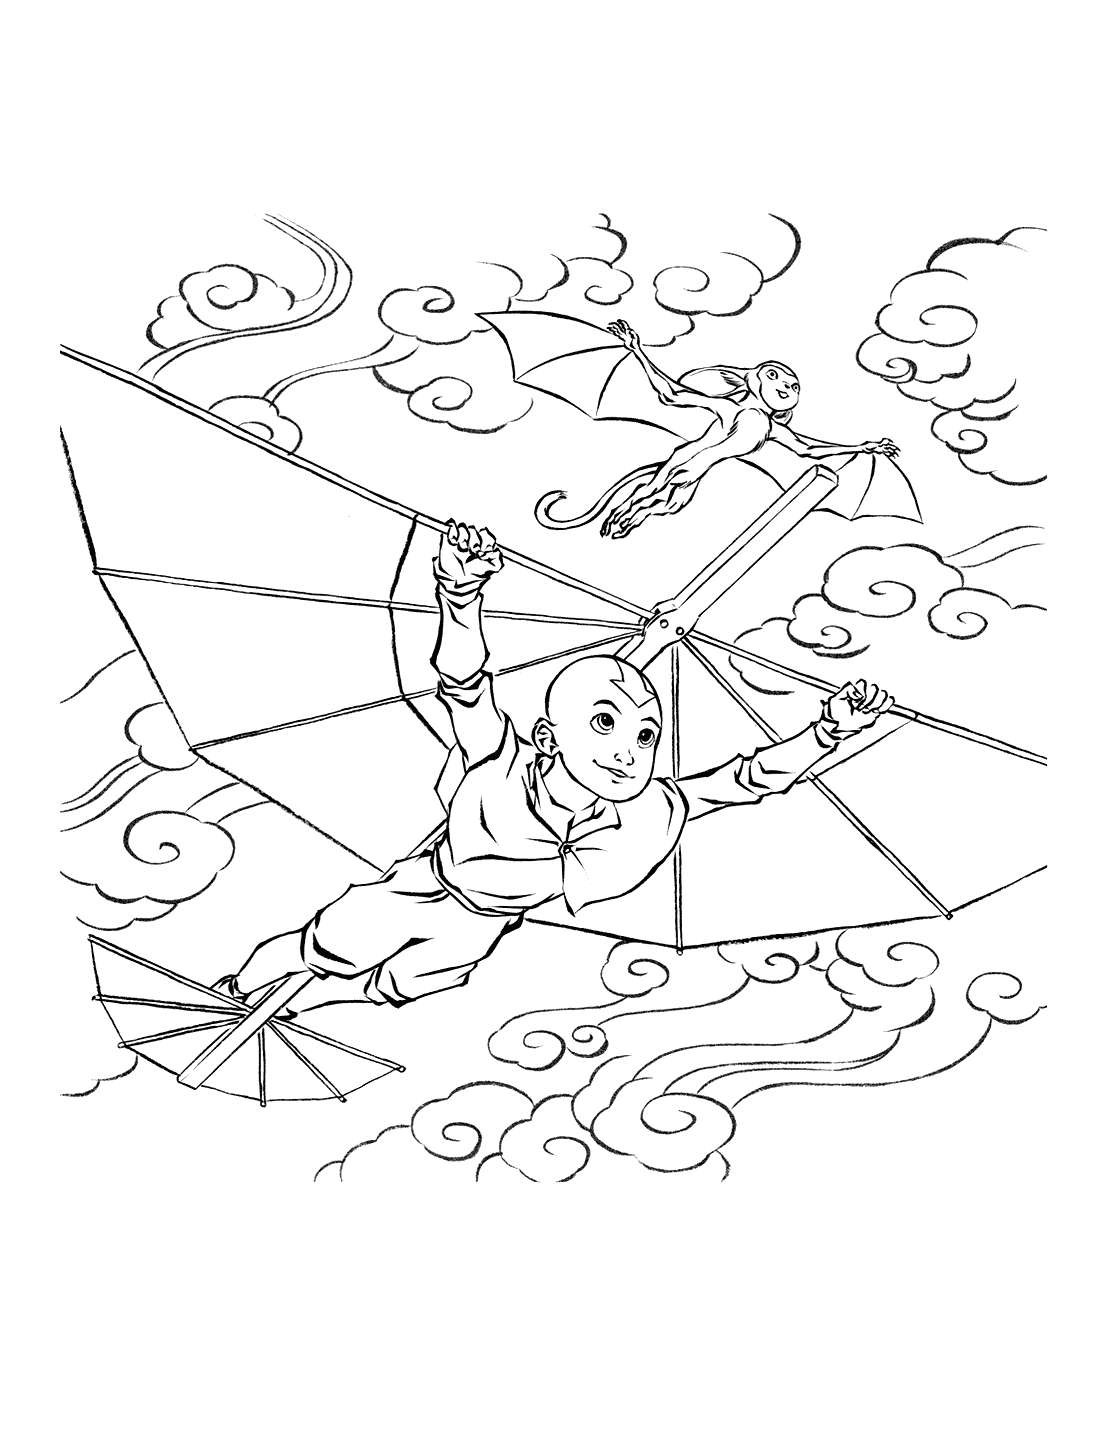 Aang And Momo Air Bending Coloring Page